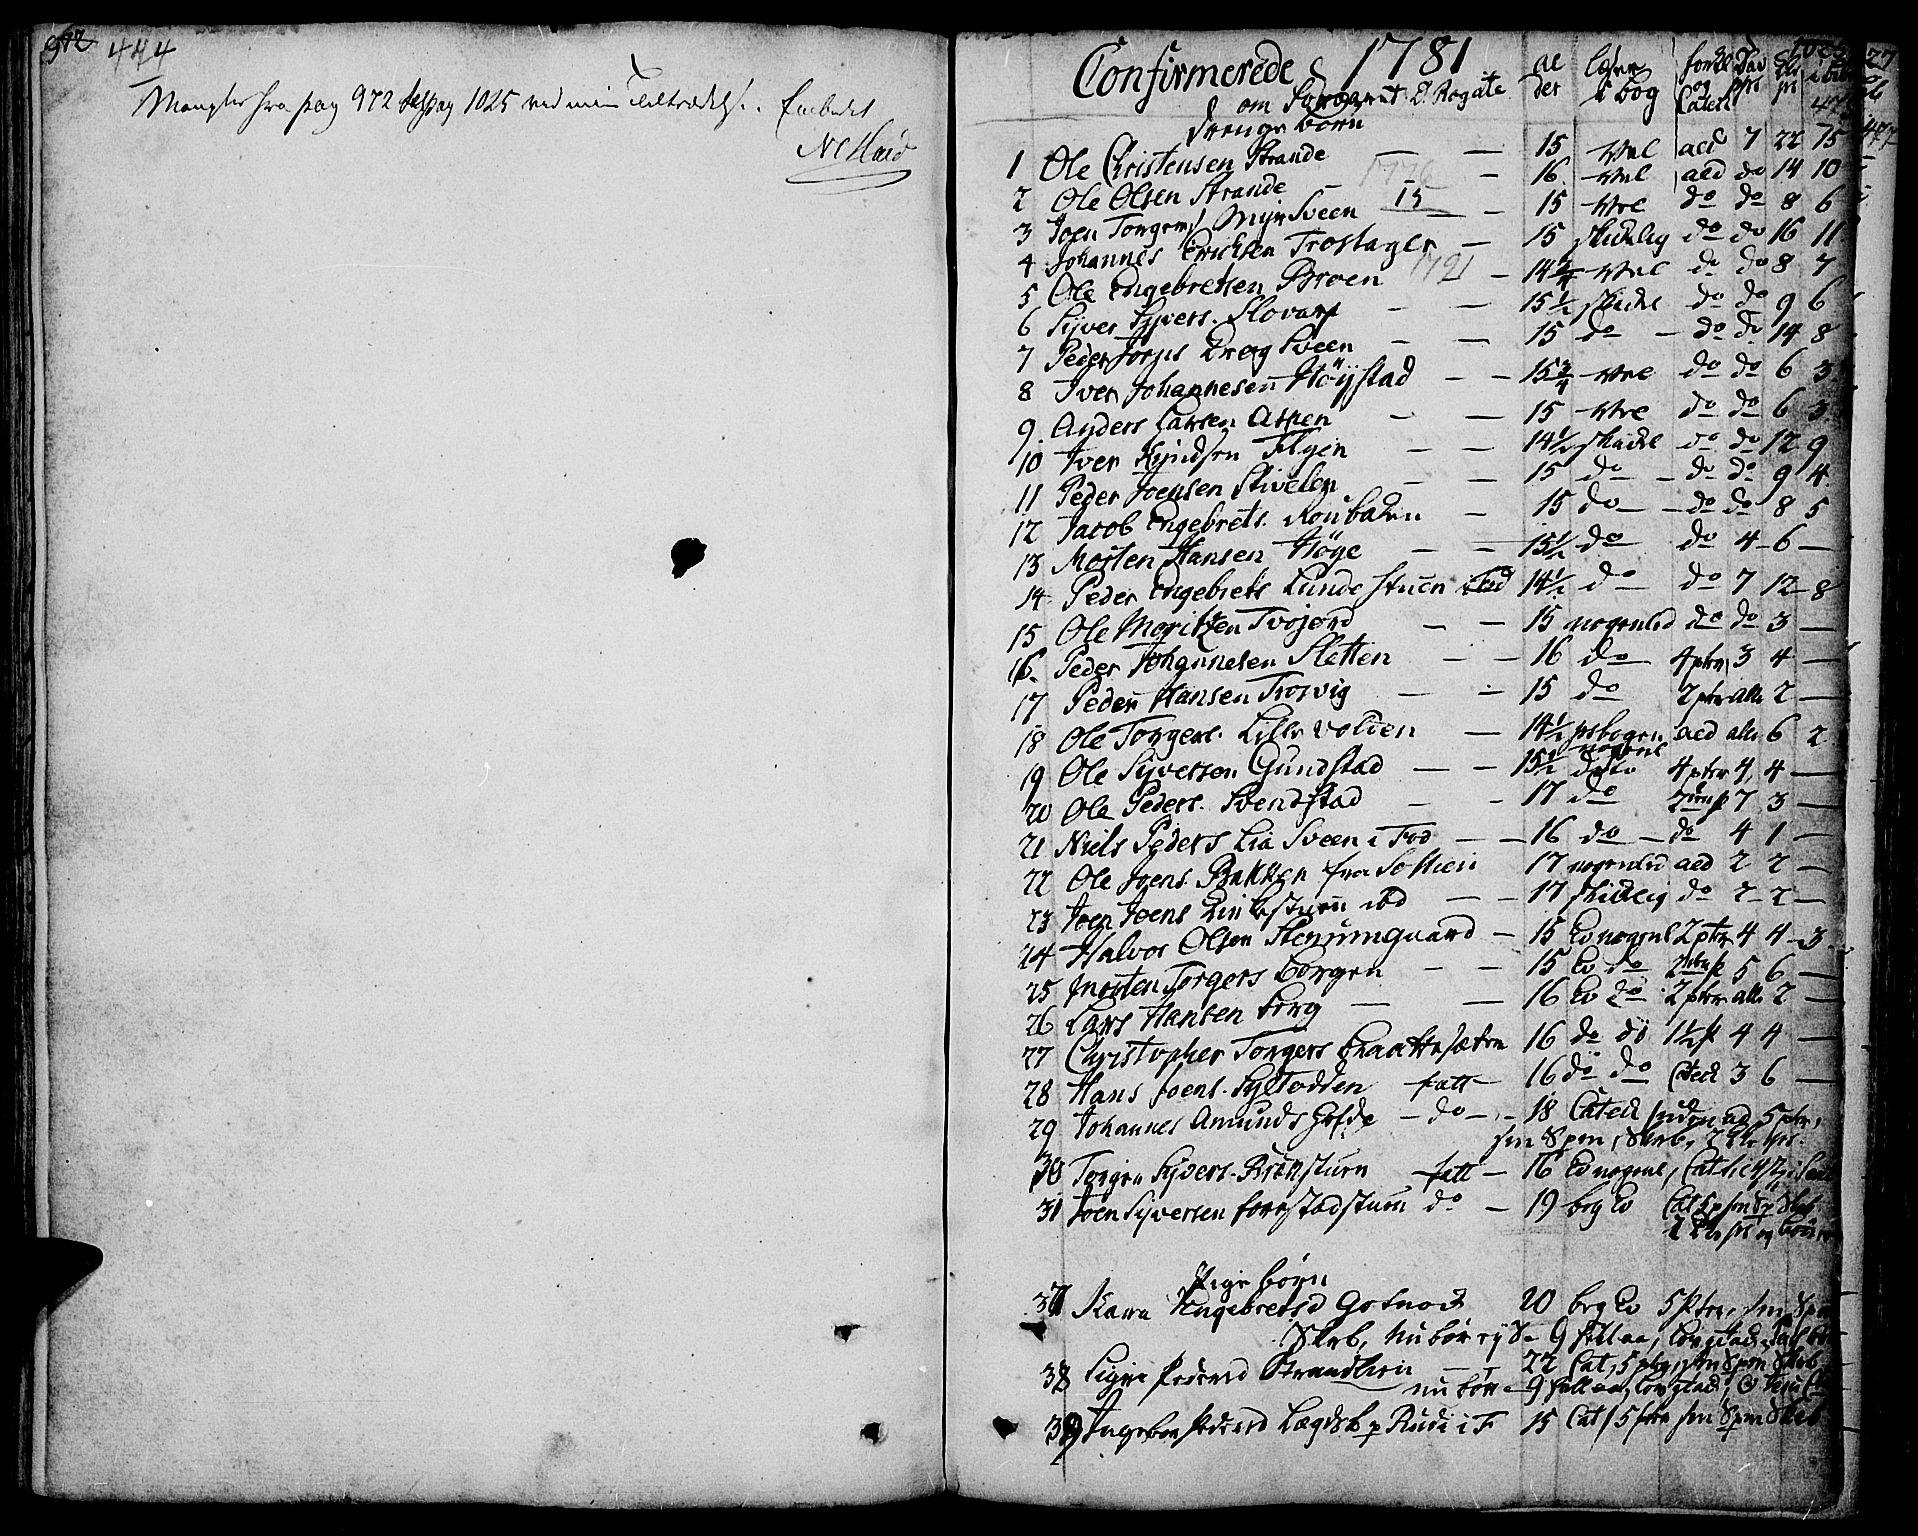 SAH, Ringebu prestekontor, Ministerialbok nr. 3, 1781-1820, s. 474-475